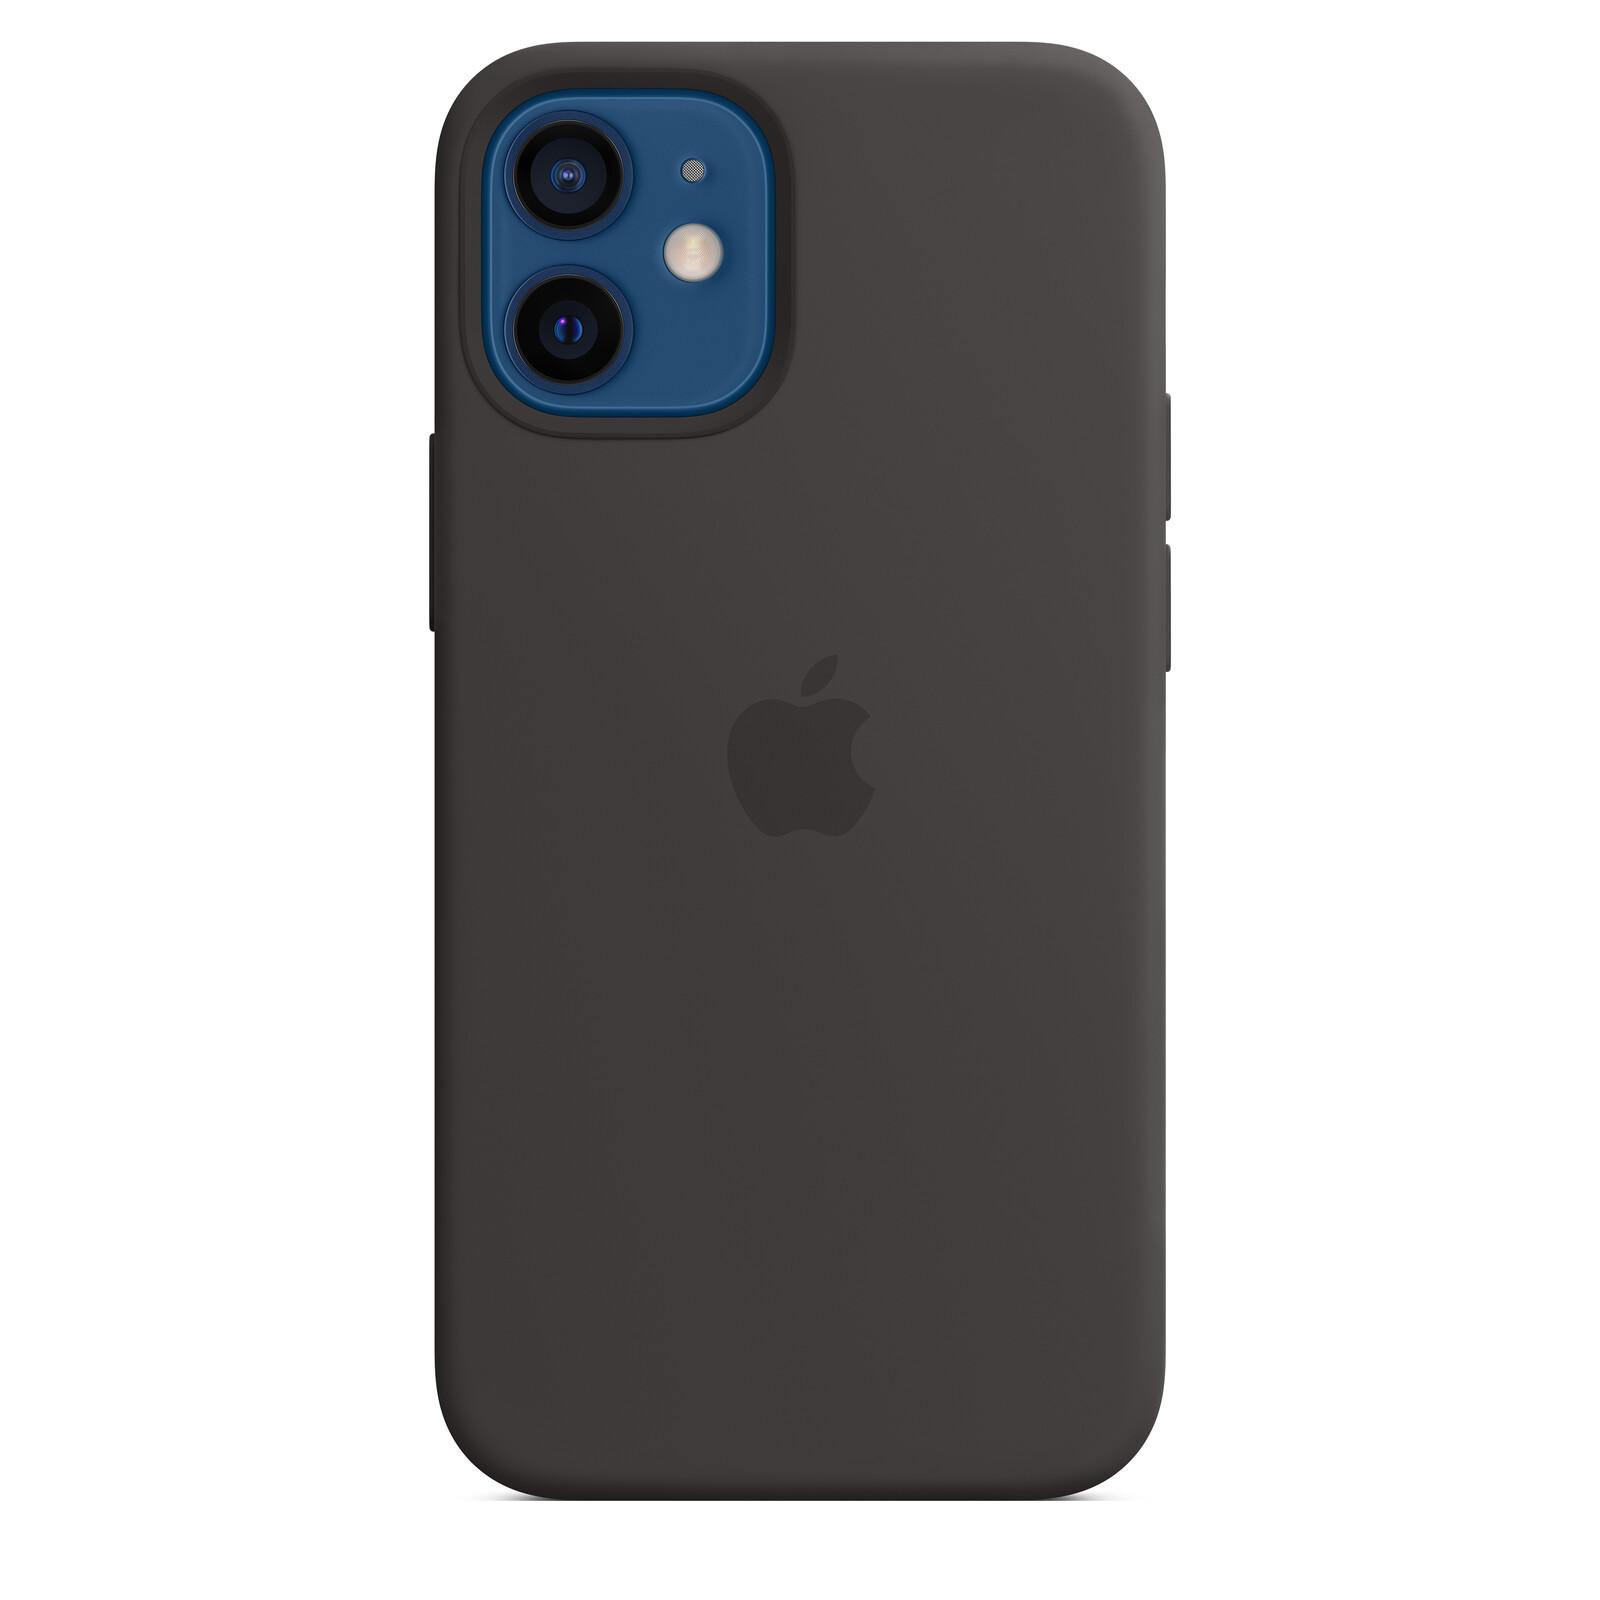 Apple iPhone 12 mini Silikon Case mit MagSafe schwarz